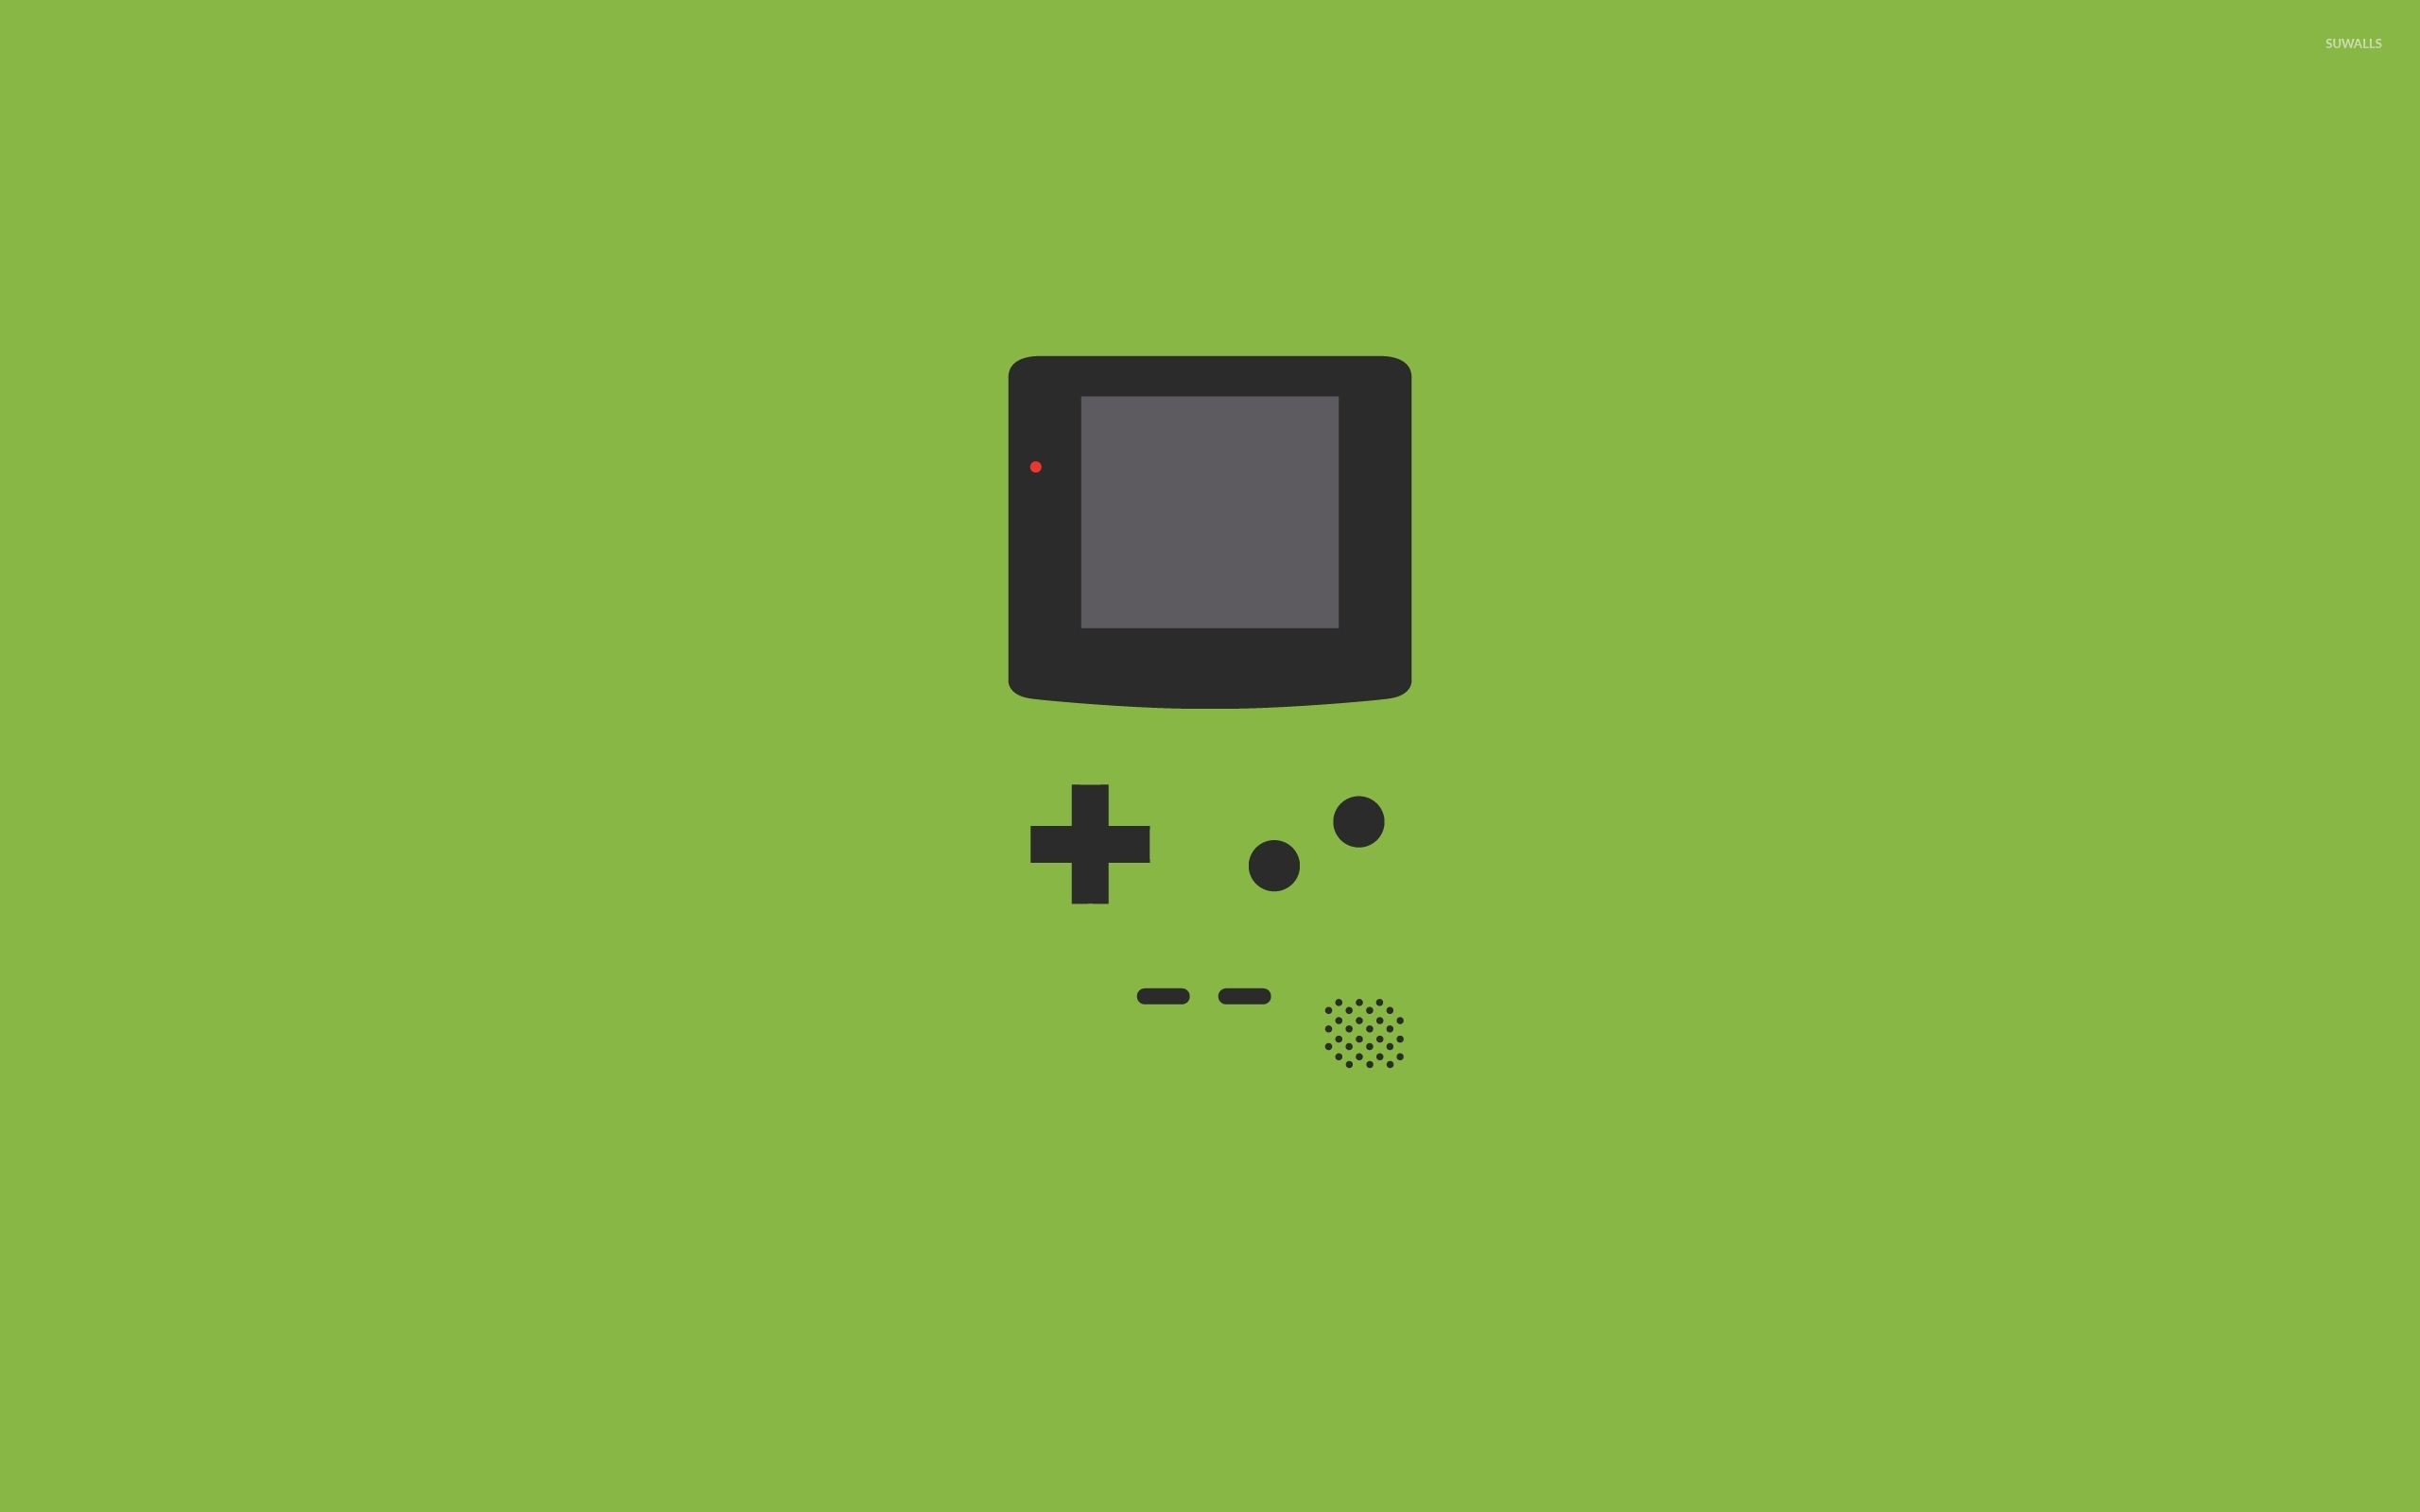 Game Boy wallpaper   Minimalistic wallpapers   43583 1366x768